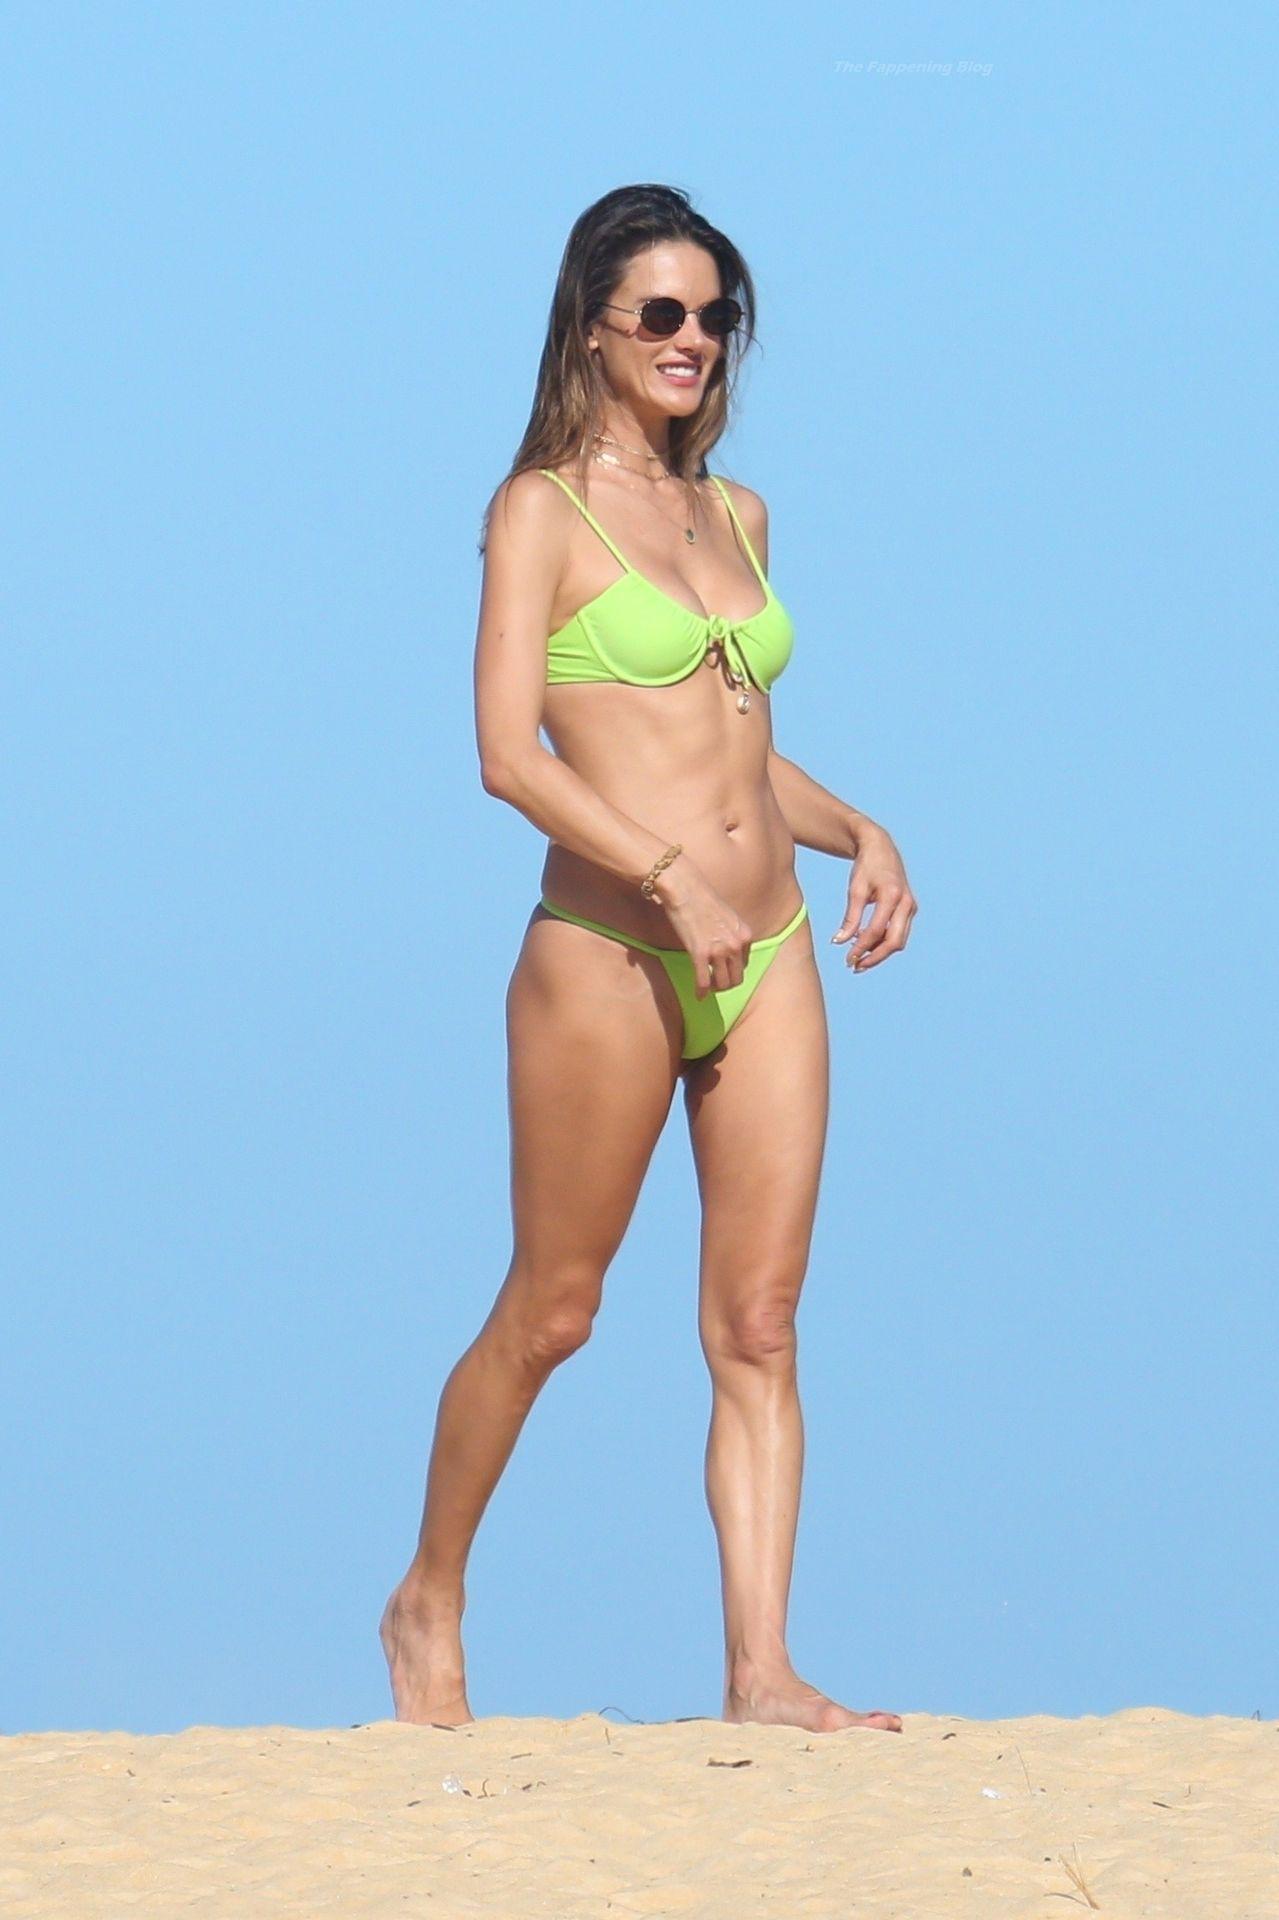 Alessandra-Ambrosio-Sexy-The-Fappening-Blog-971.jpg